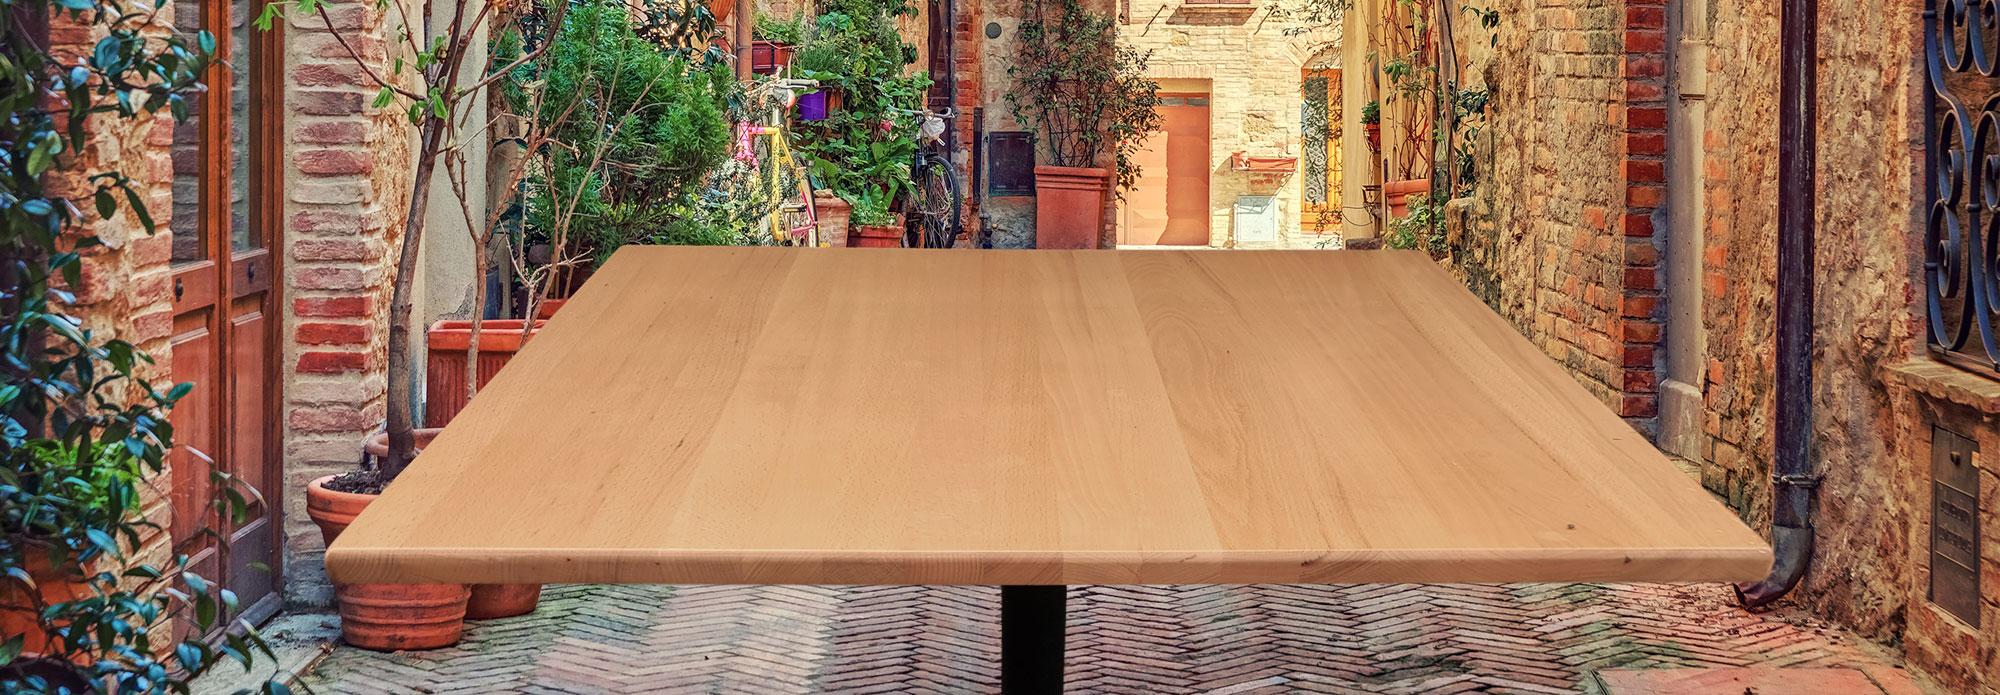 Tuscany Table Top